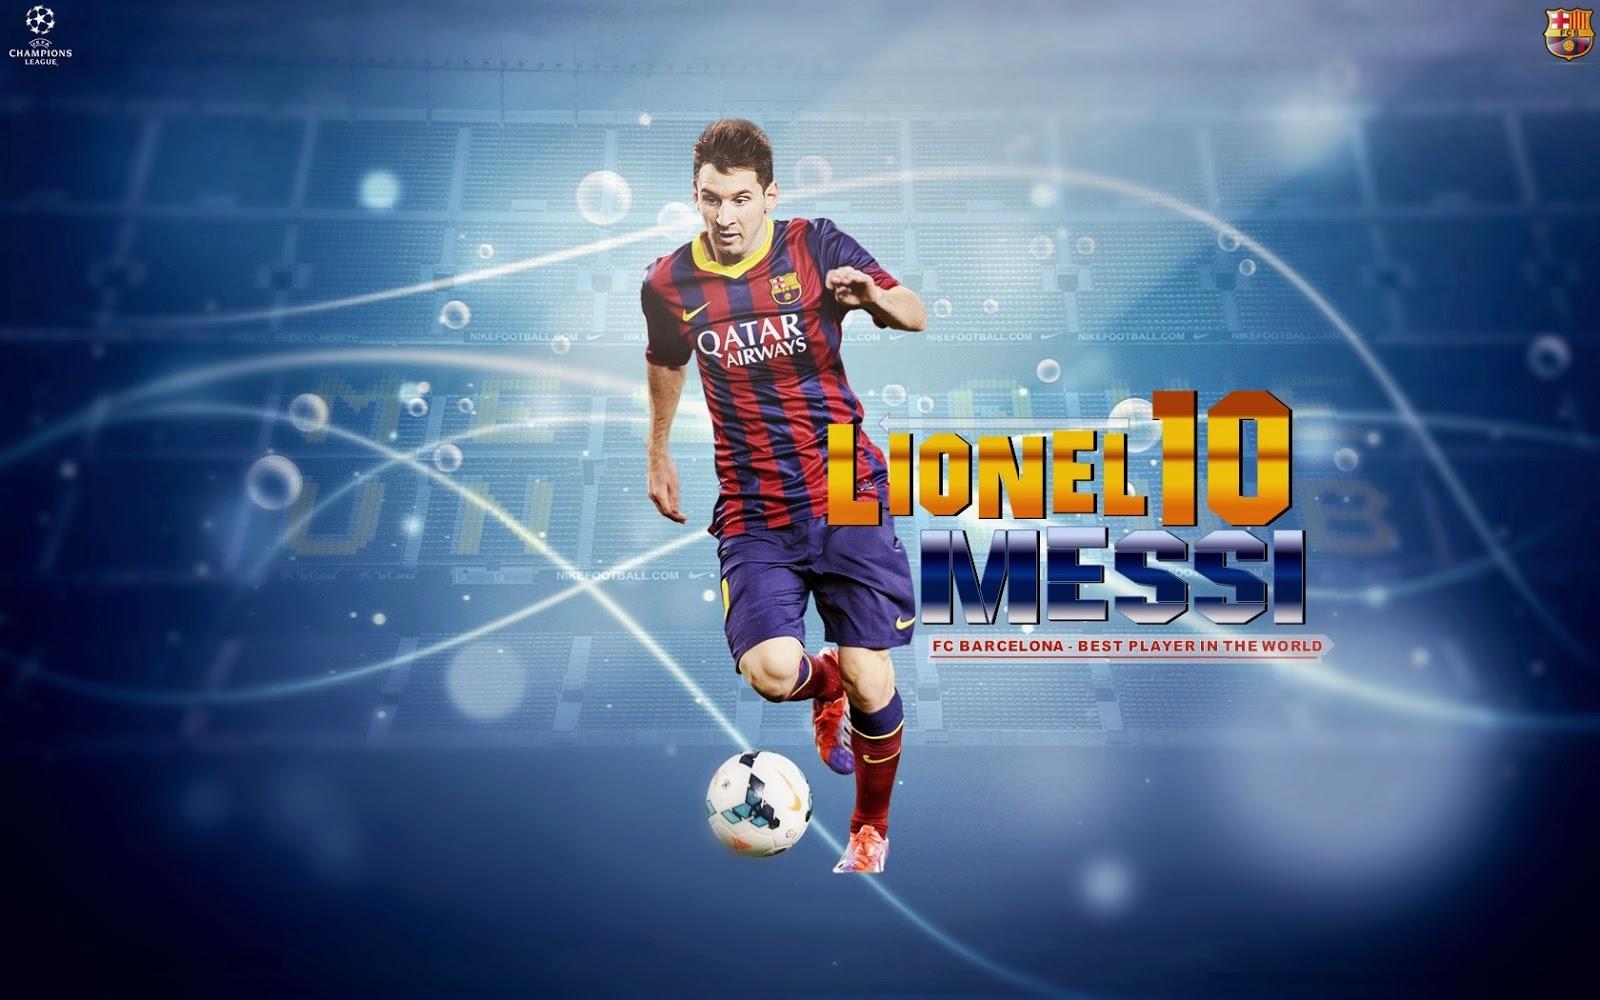 lionel messi hd wallpapers desktop lionel messi hd wallpapers download 1600x1000